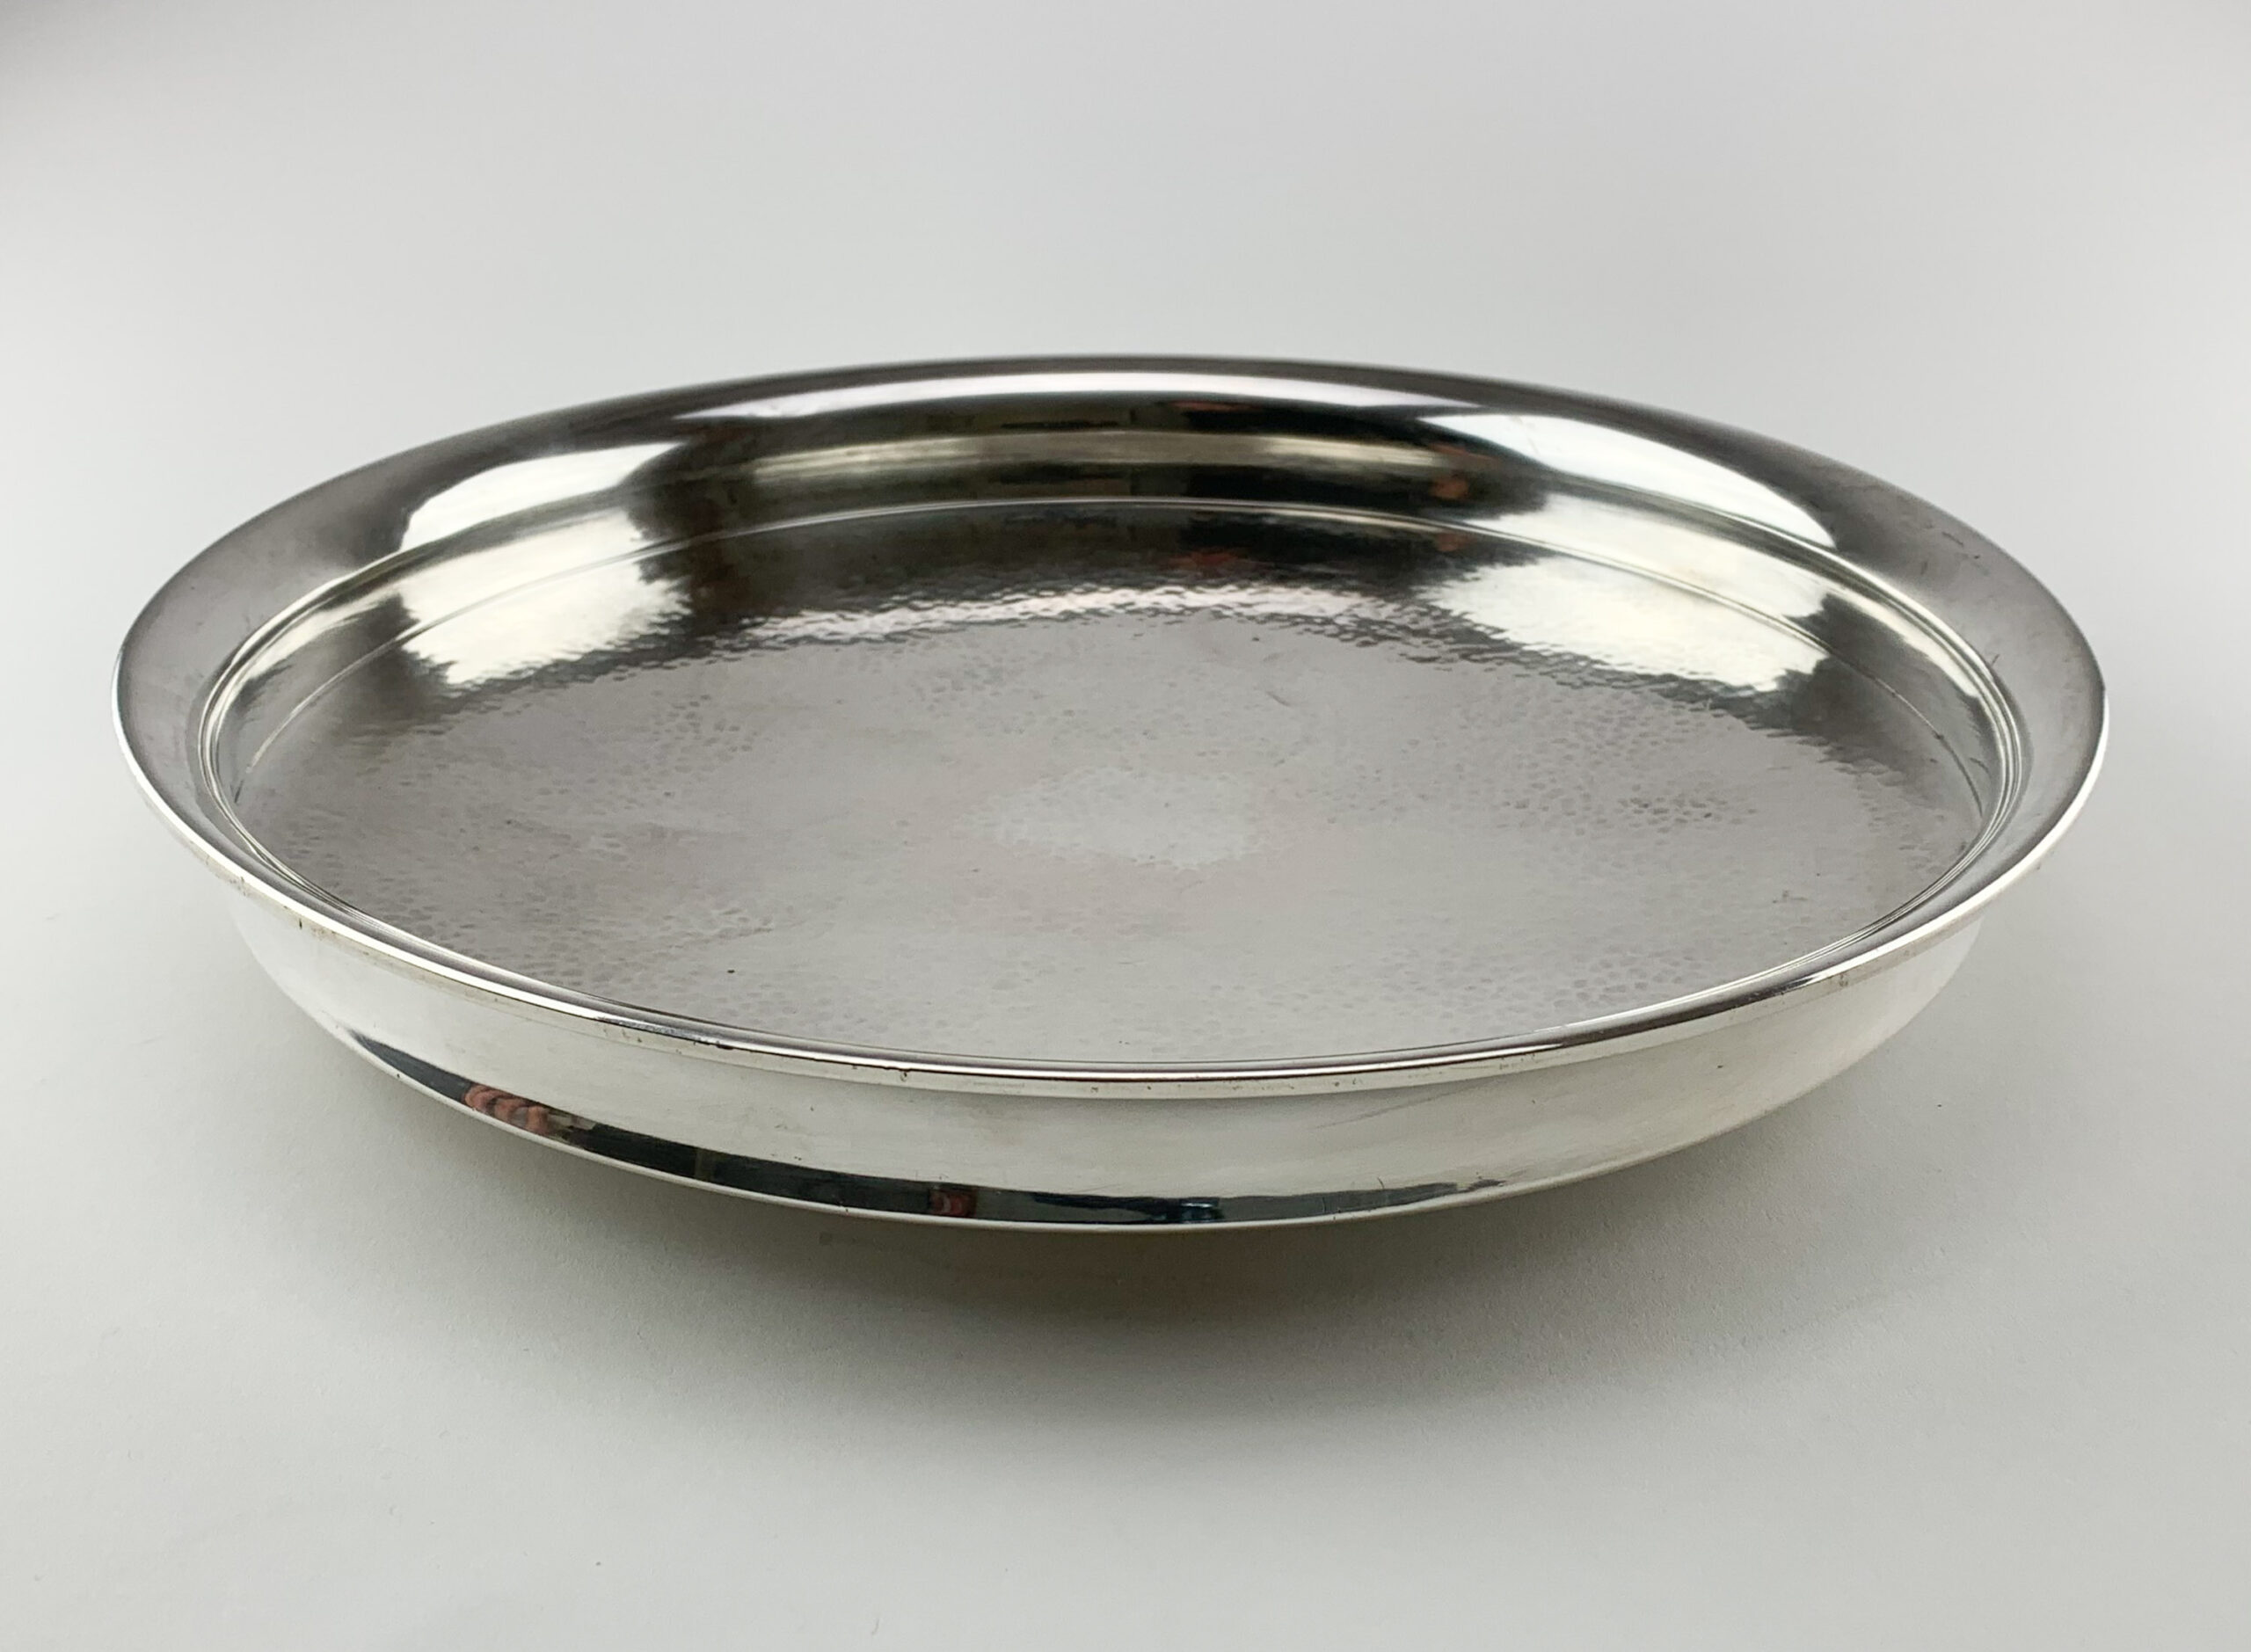 TW silver dish web-1479